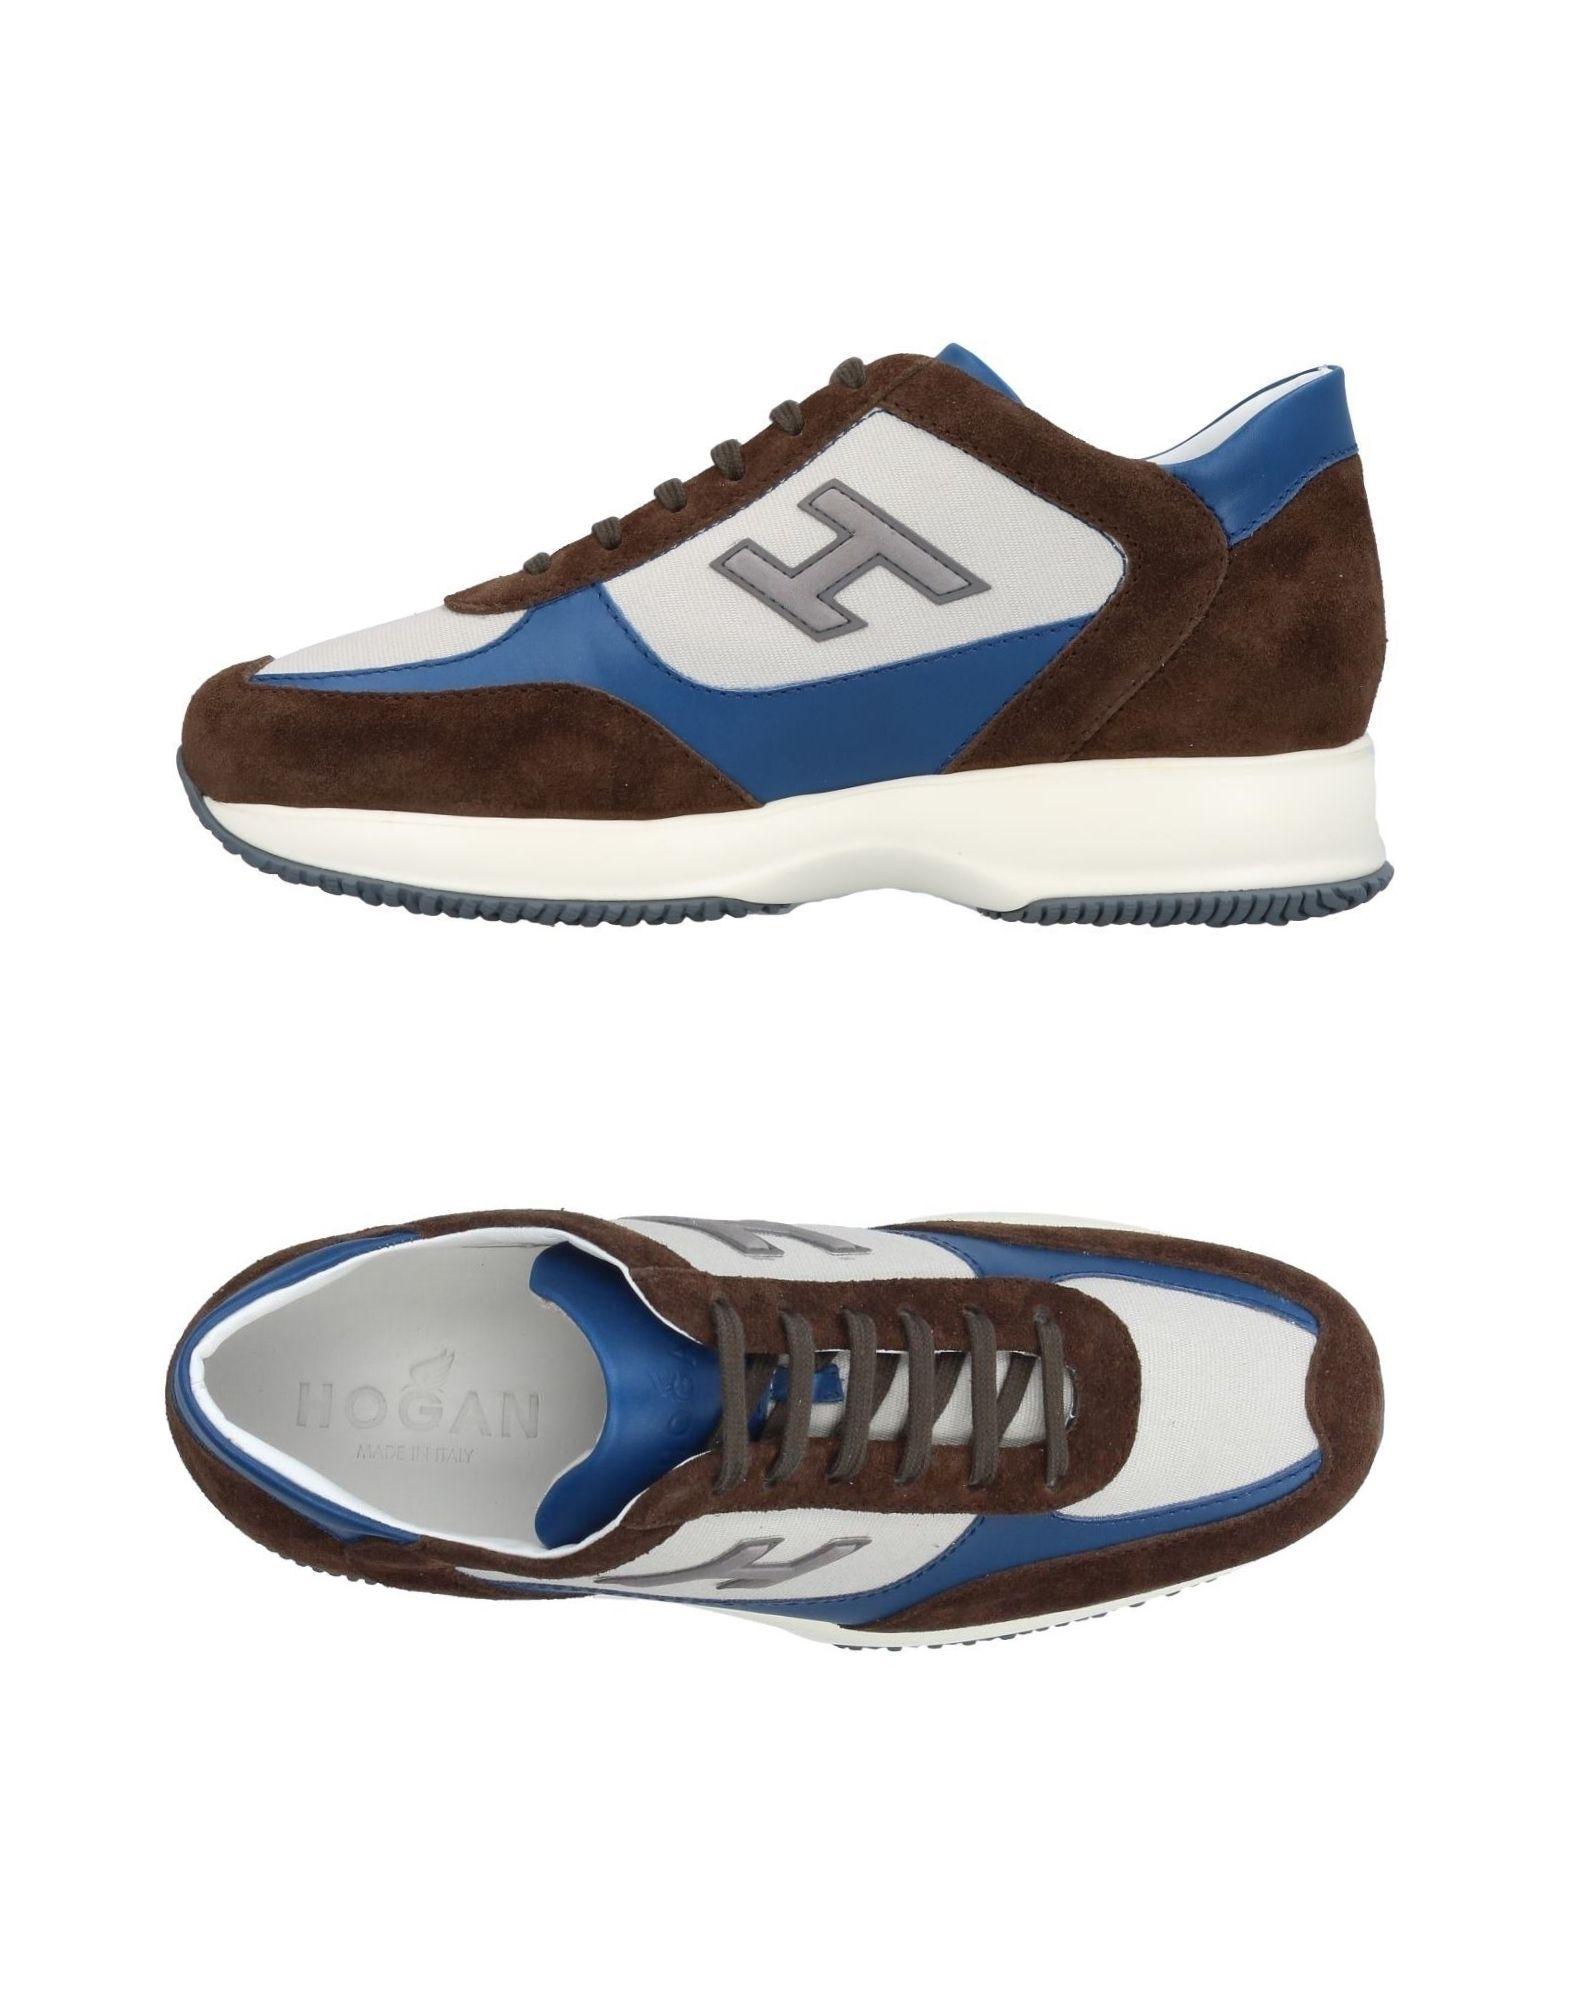 A buon mercato Sneakers Hogan Uomo - 11337930JH